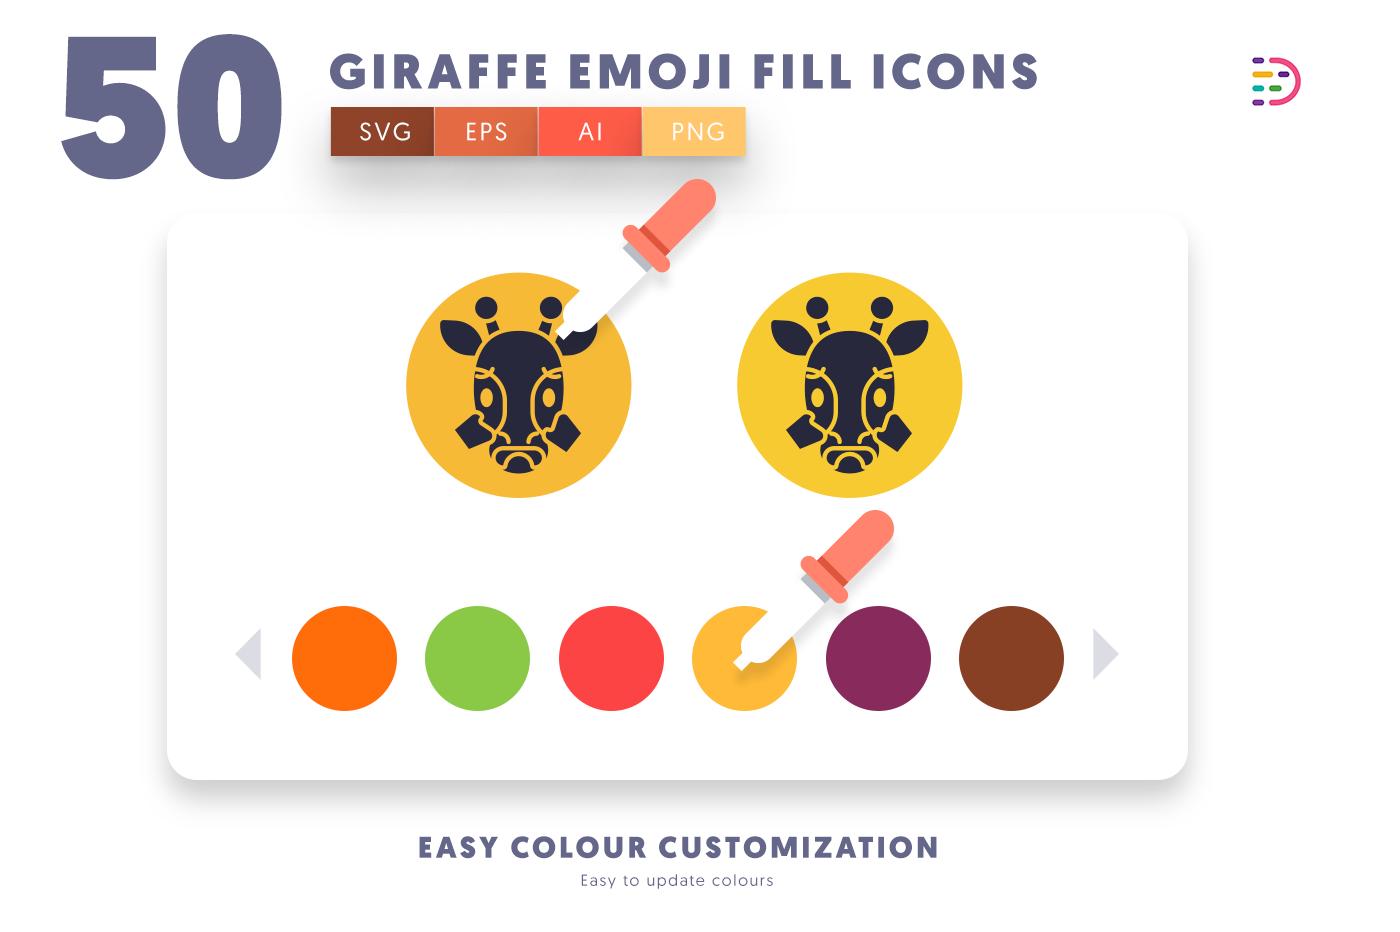 Customizable and vector 50 Giraffe Emoji Fill Icons